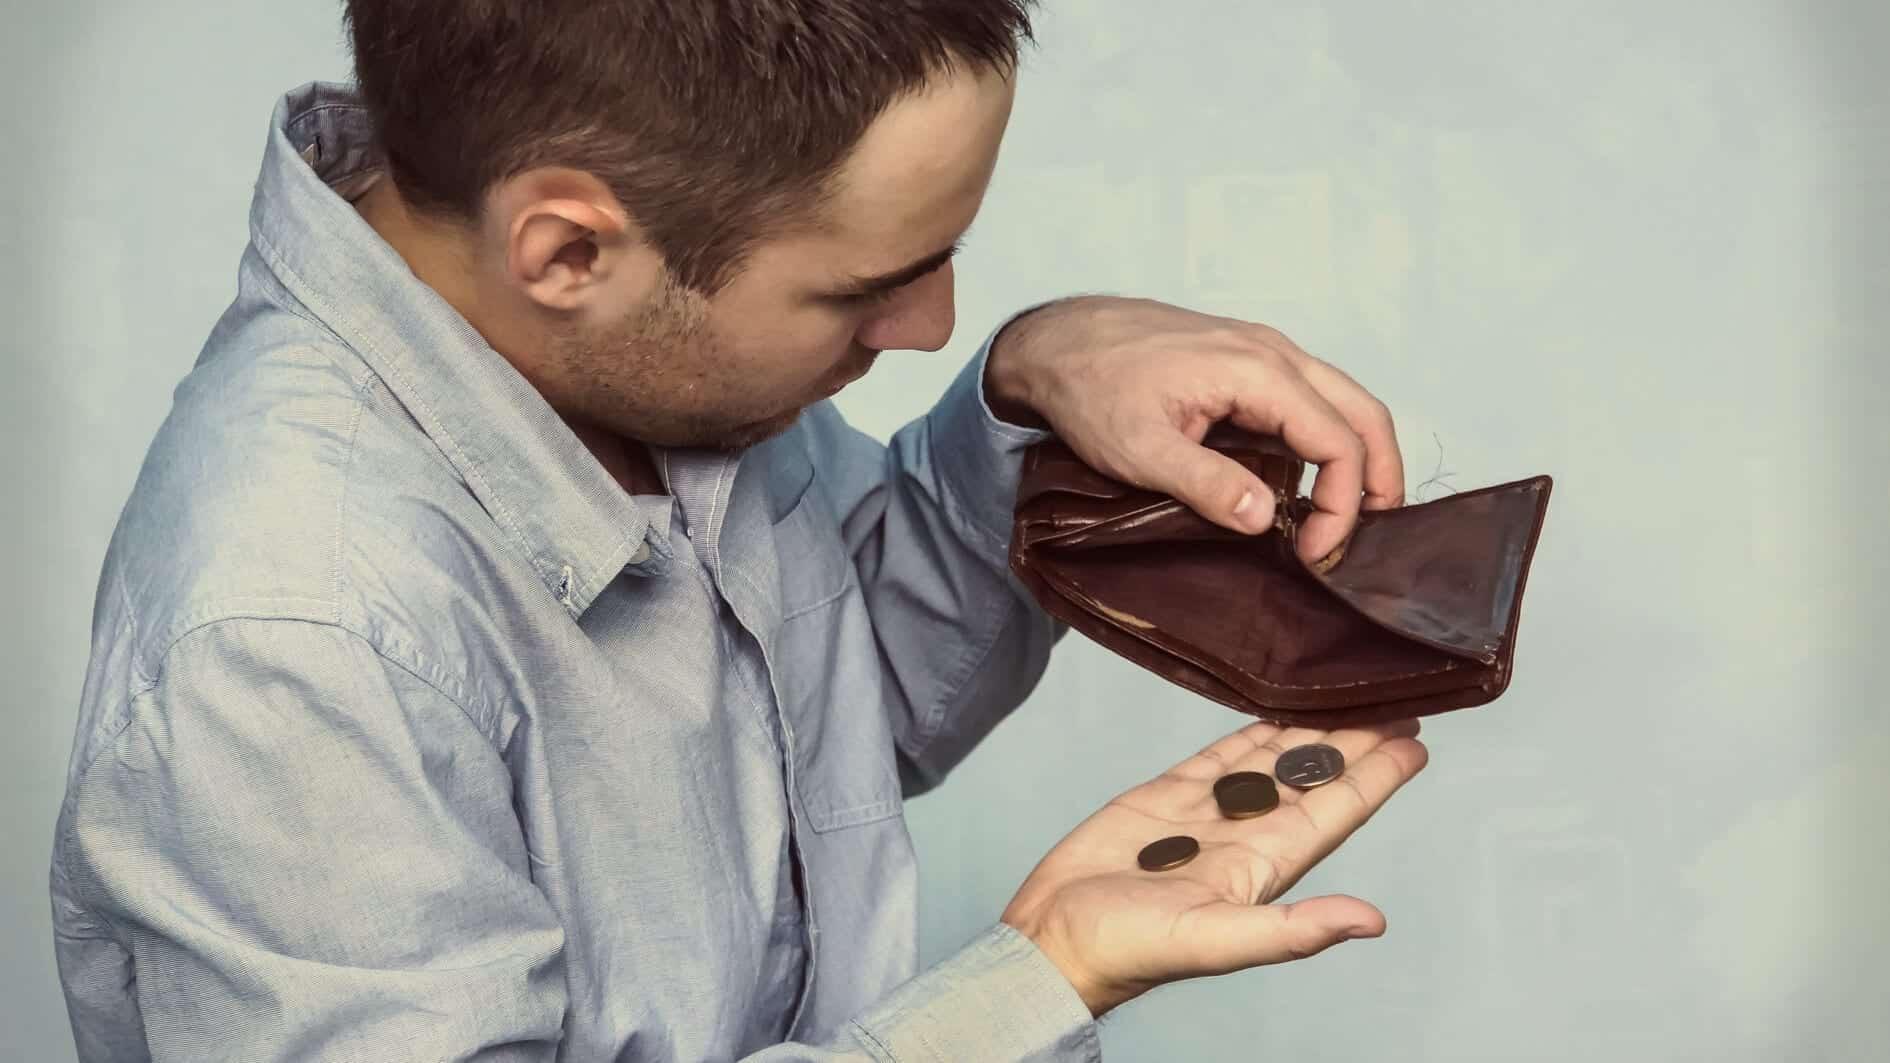 Perlukah Anda Menerima Tawaran Kerja Gaji Rendah?